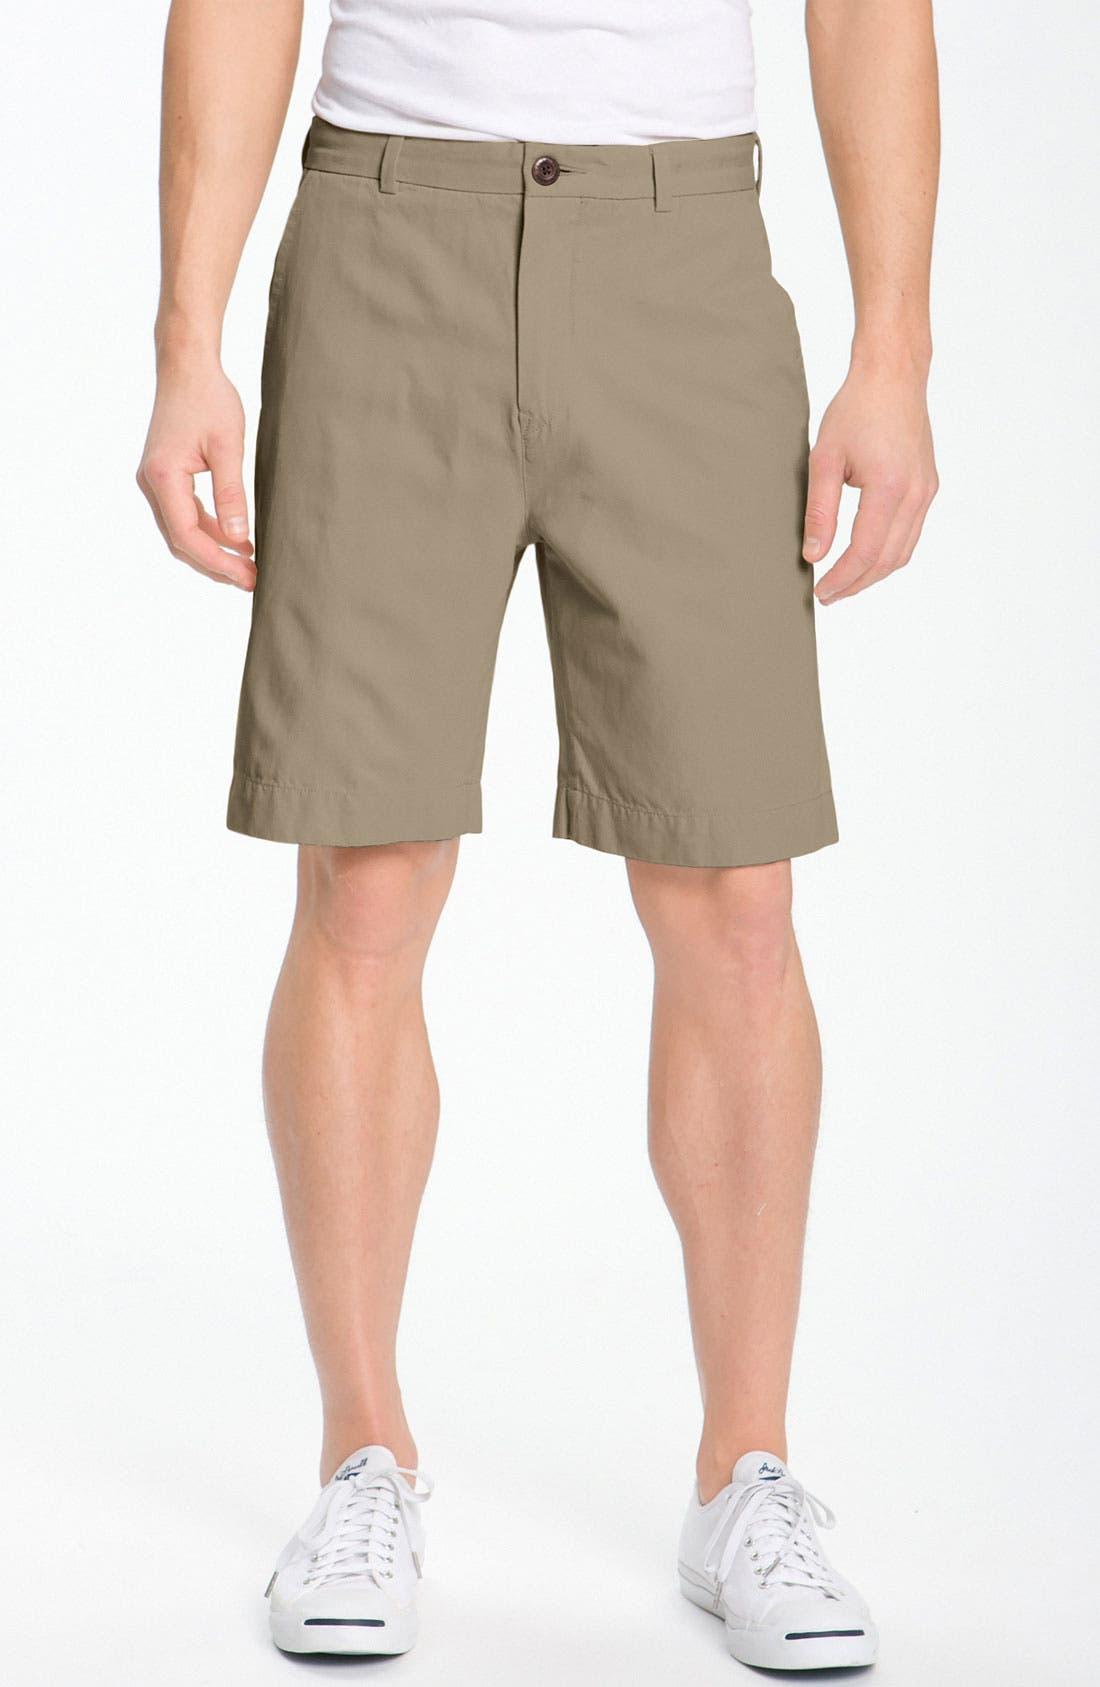 Alternate Image 1 Selected - Saltaire 'Malibu' Bermuda Shorts